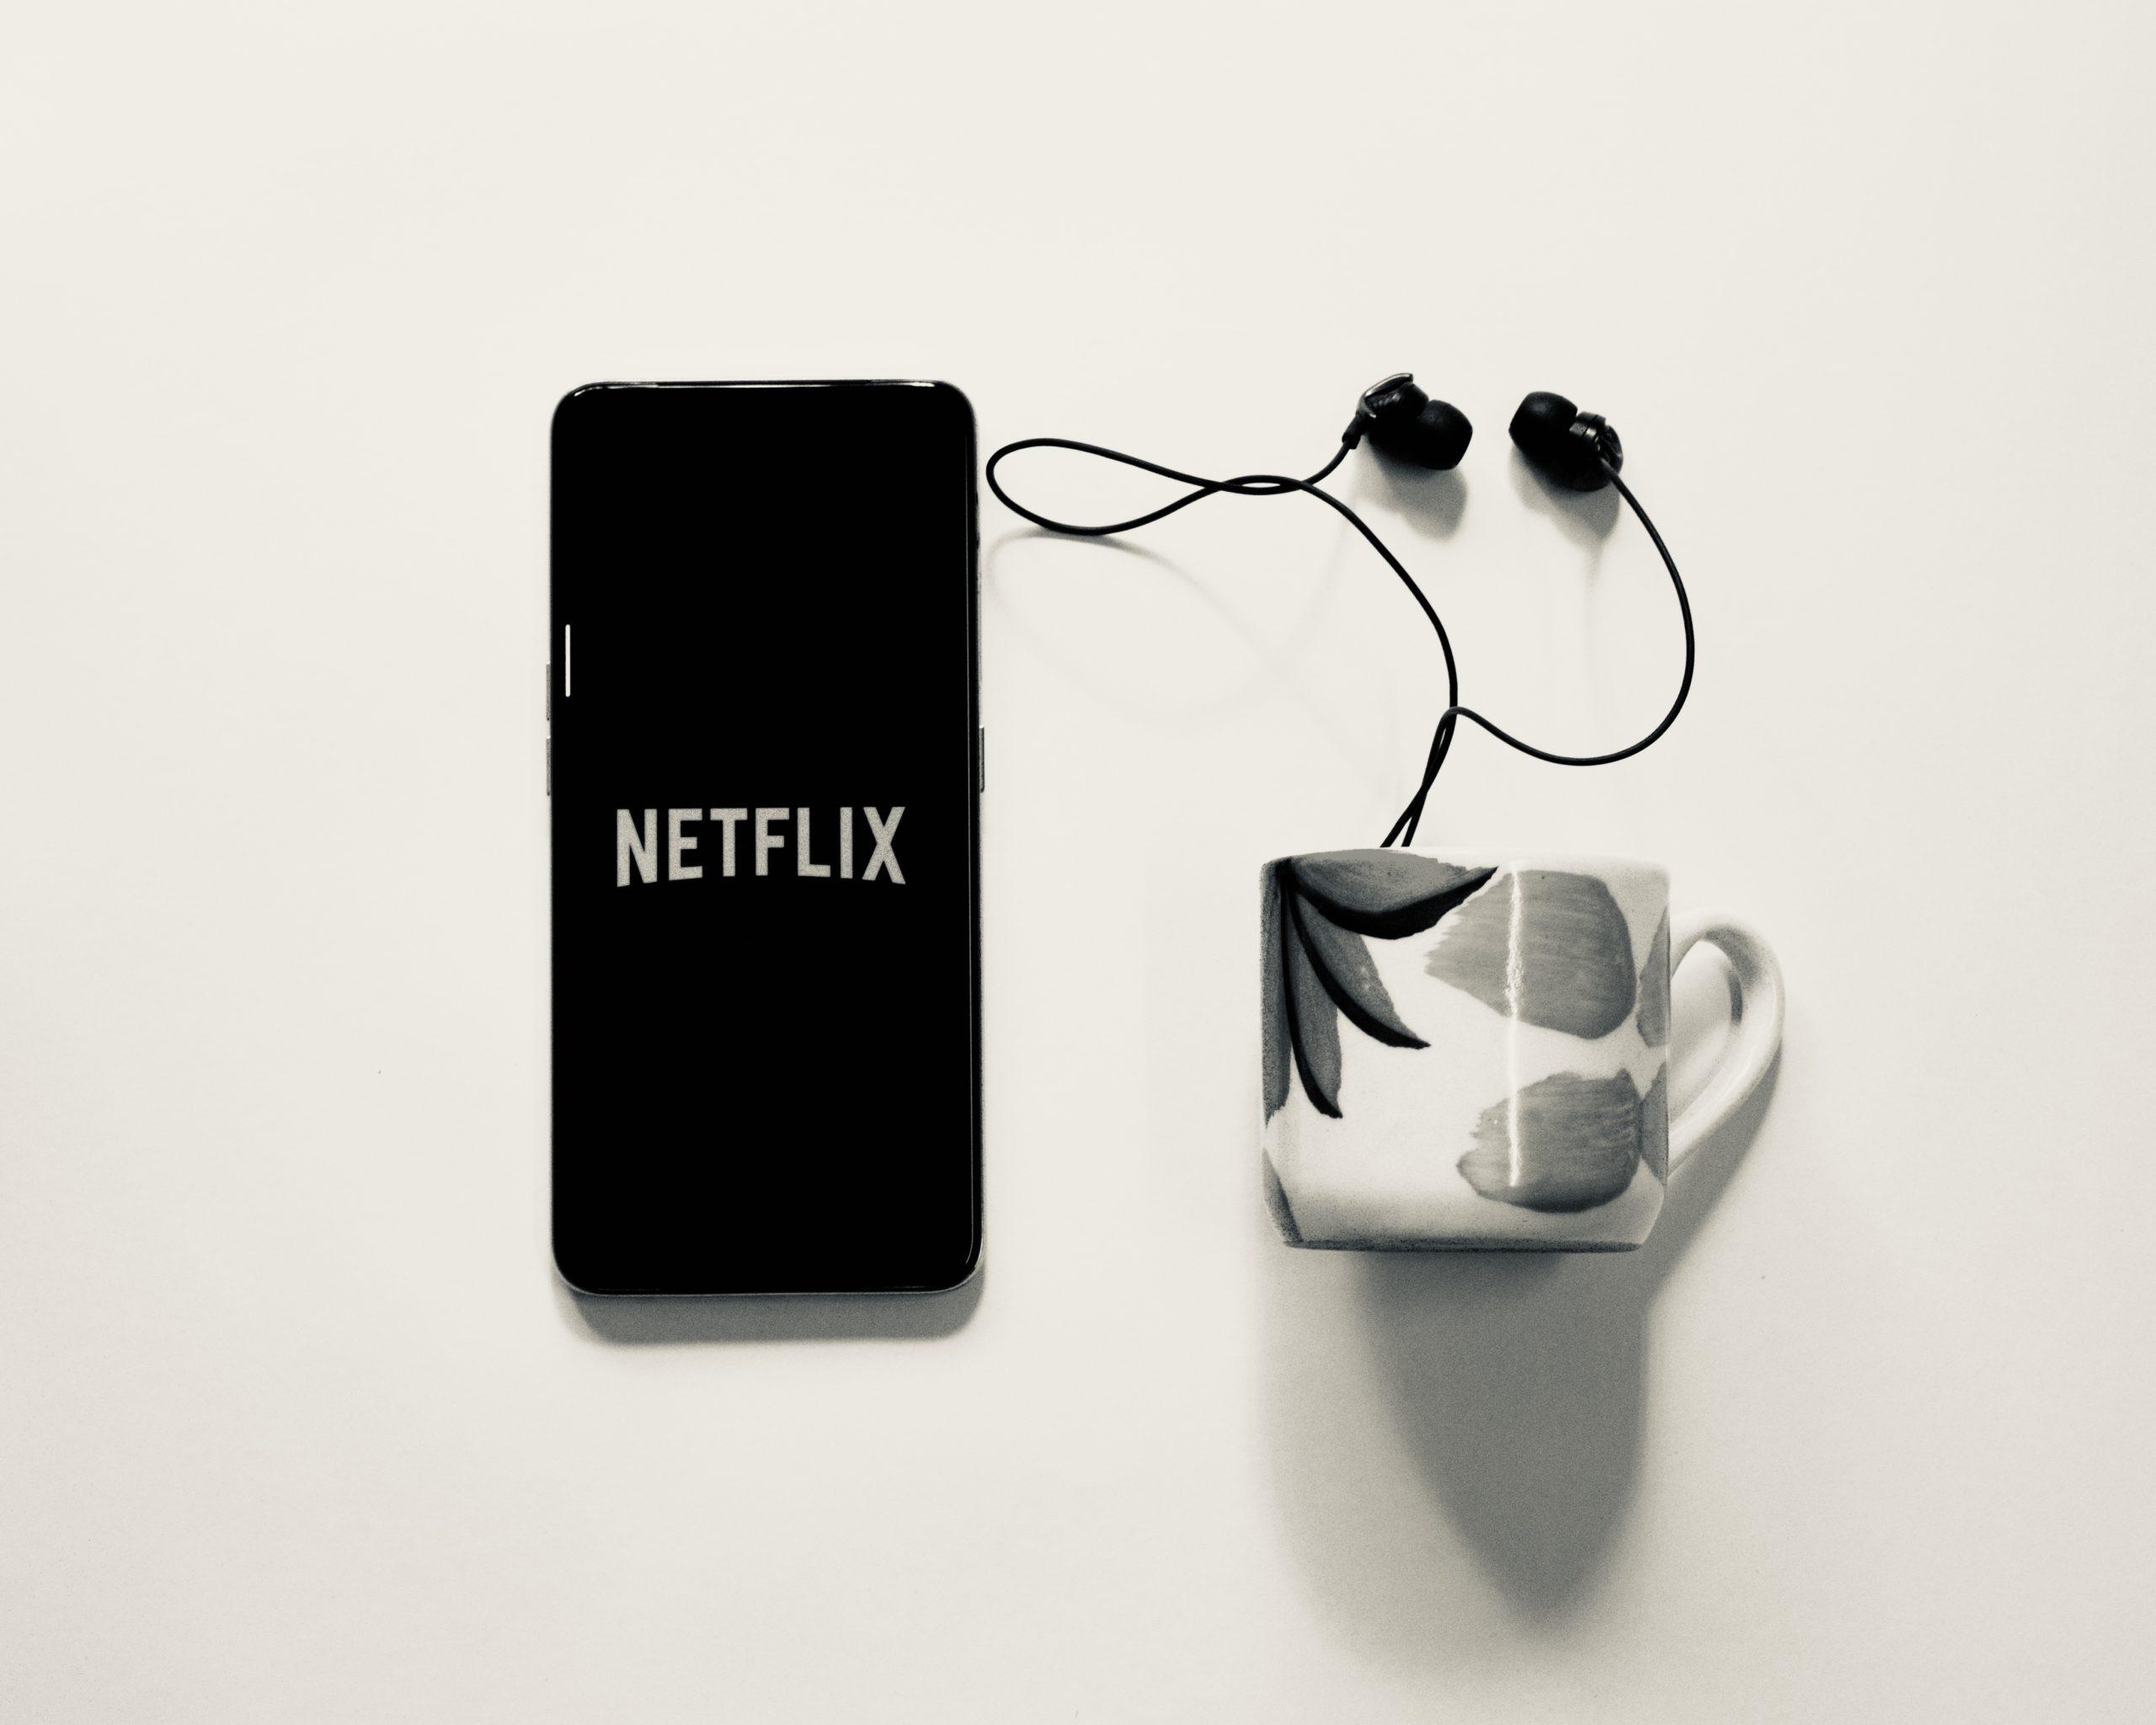 Netflix smartphone display